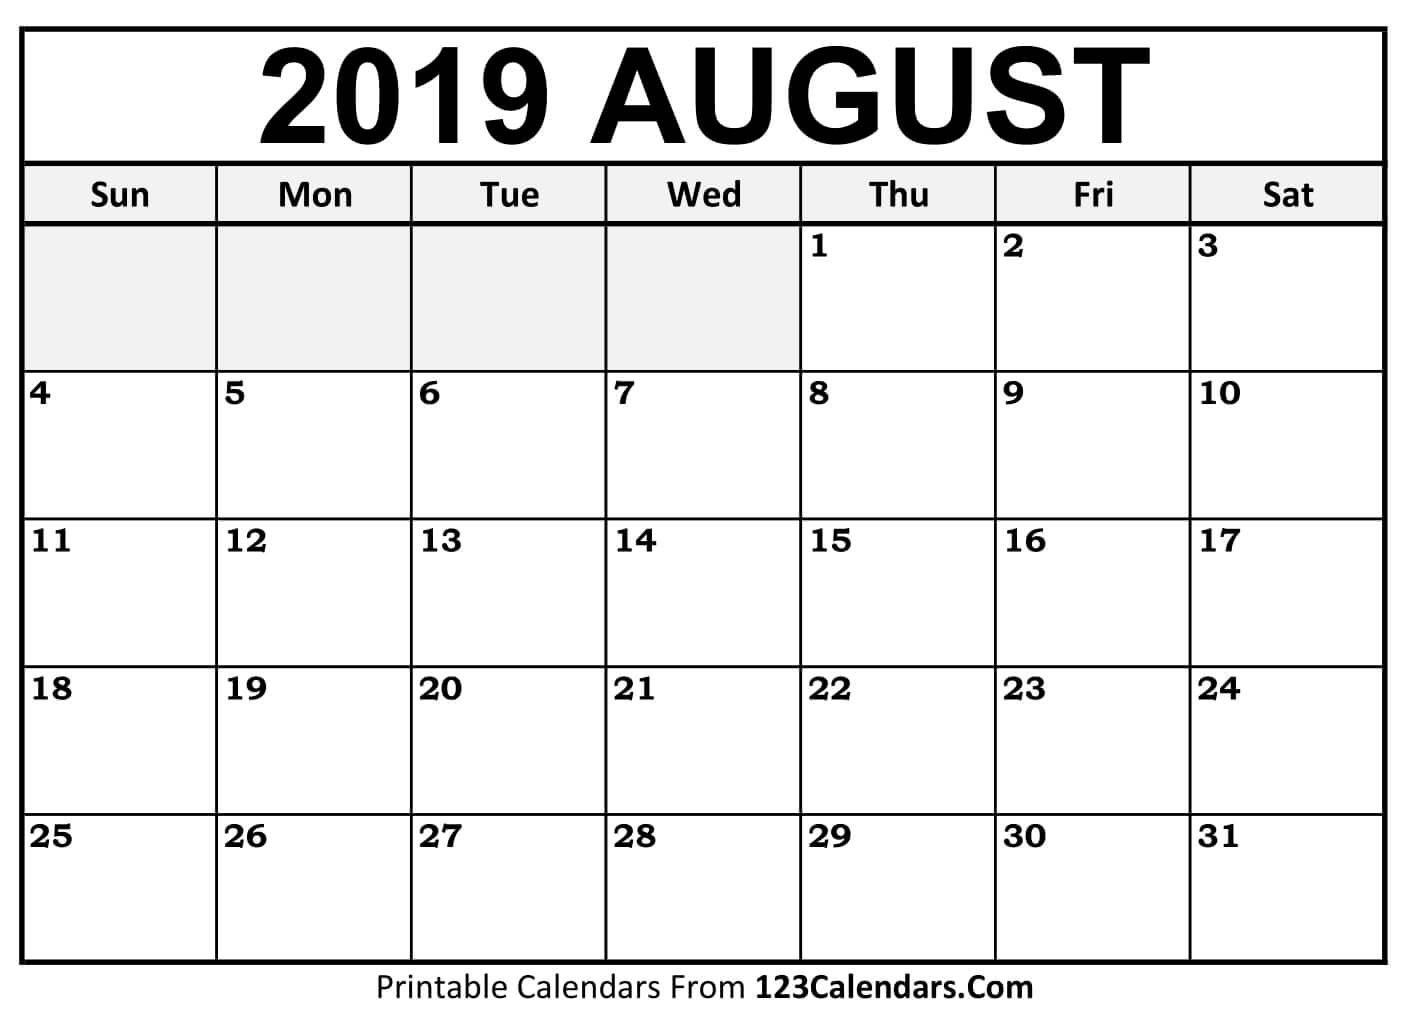 Printable August 2019 Calendar Templates - 123Calendars Calendar Of 2019 August